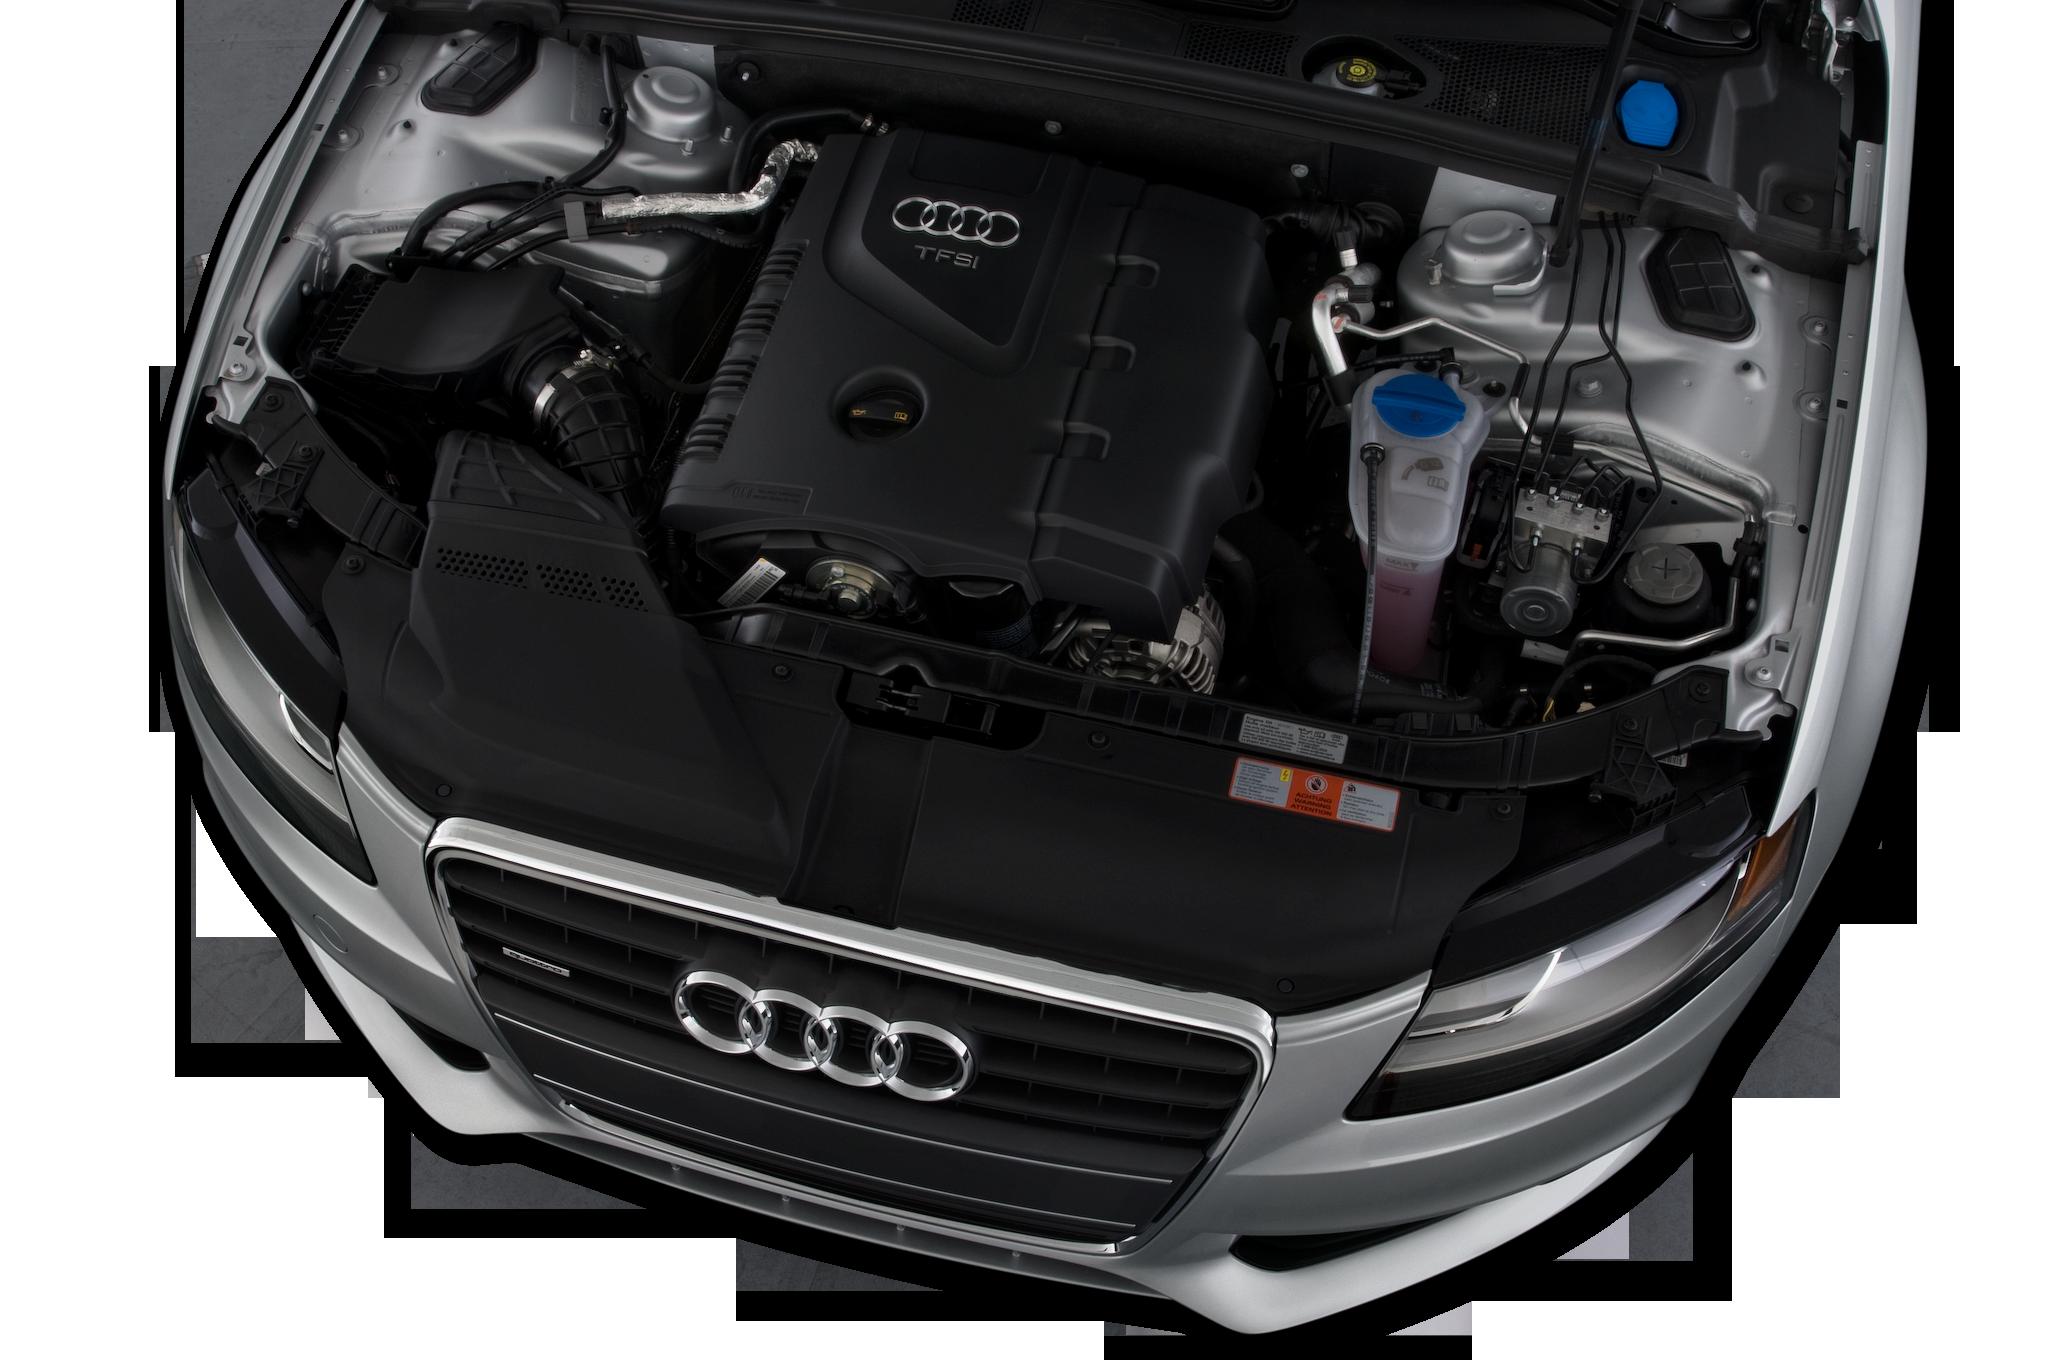 2x Quattro Audi Adds Eight Speed Automatics To 2011 A4 A5 Q5 Q7